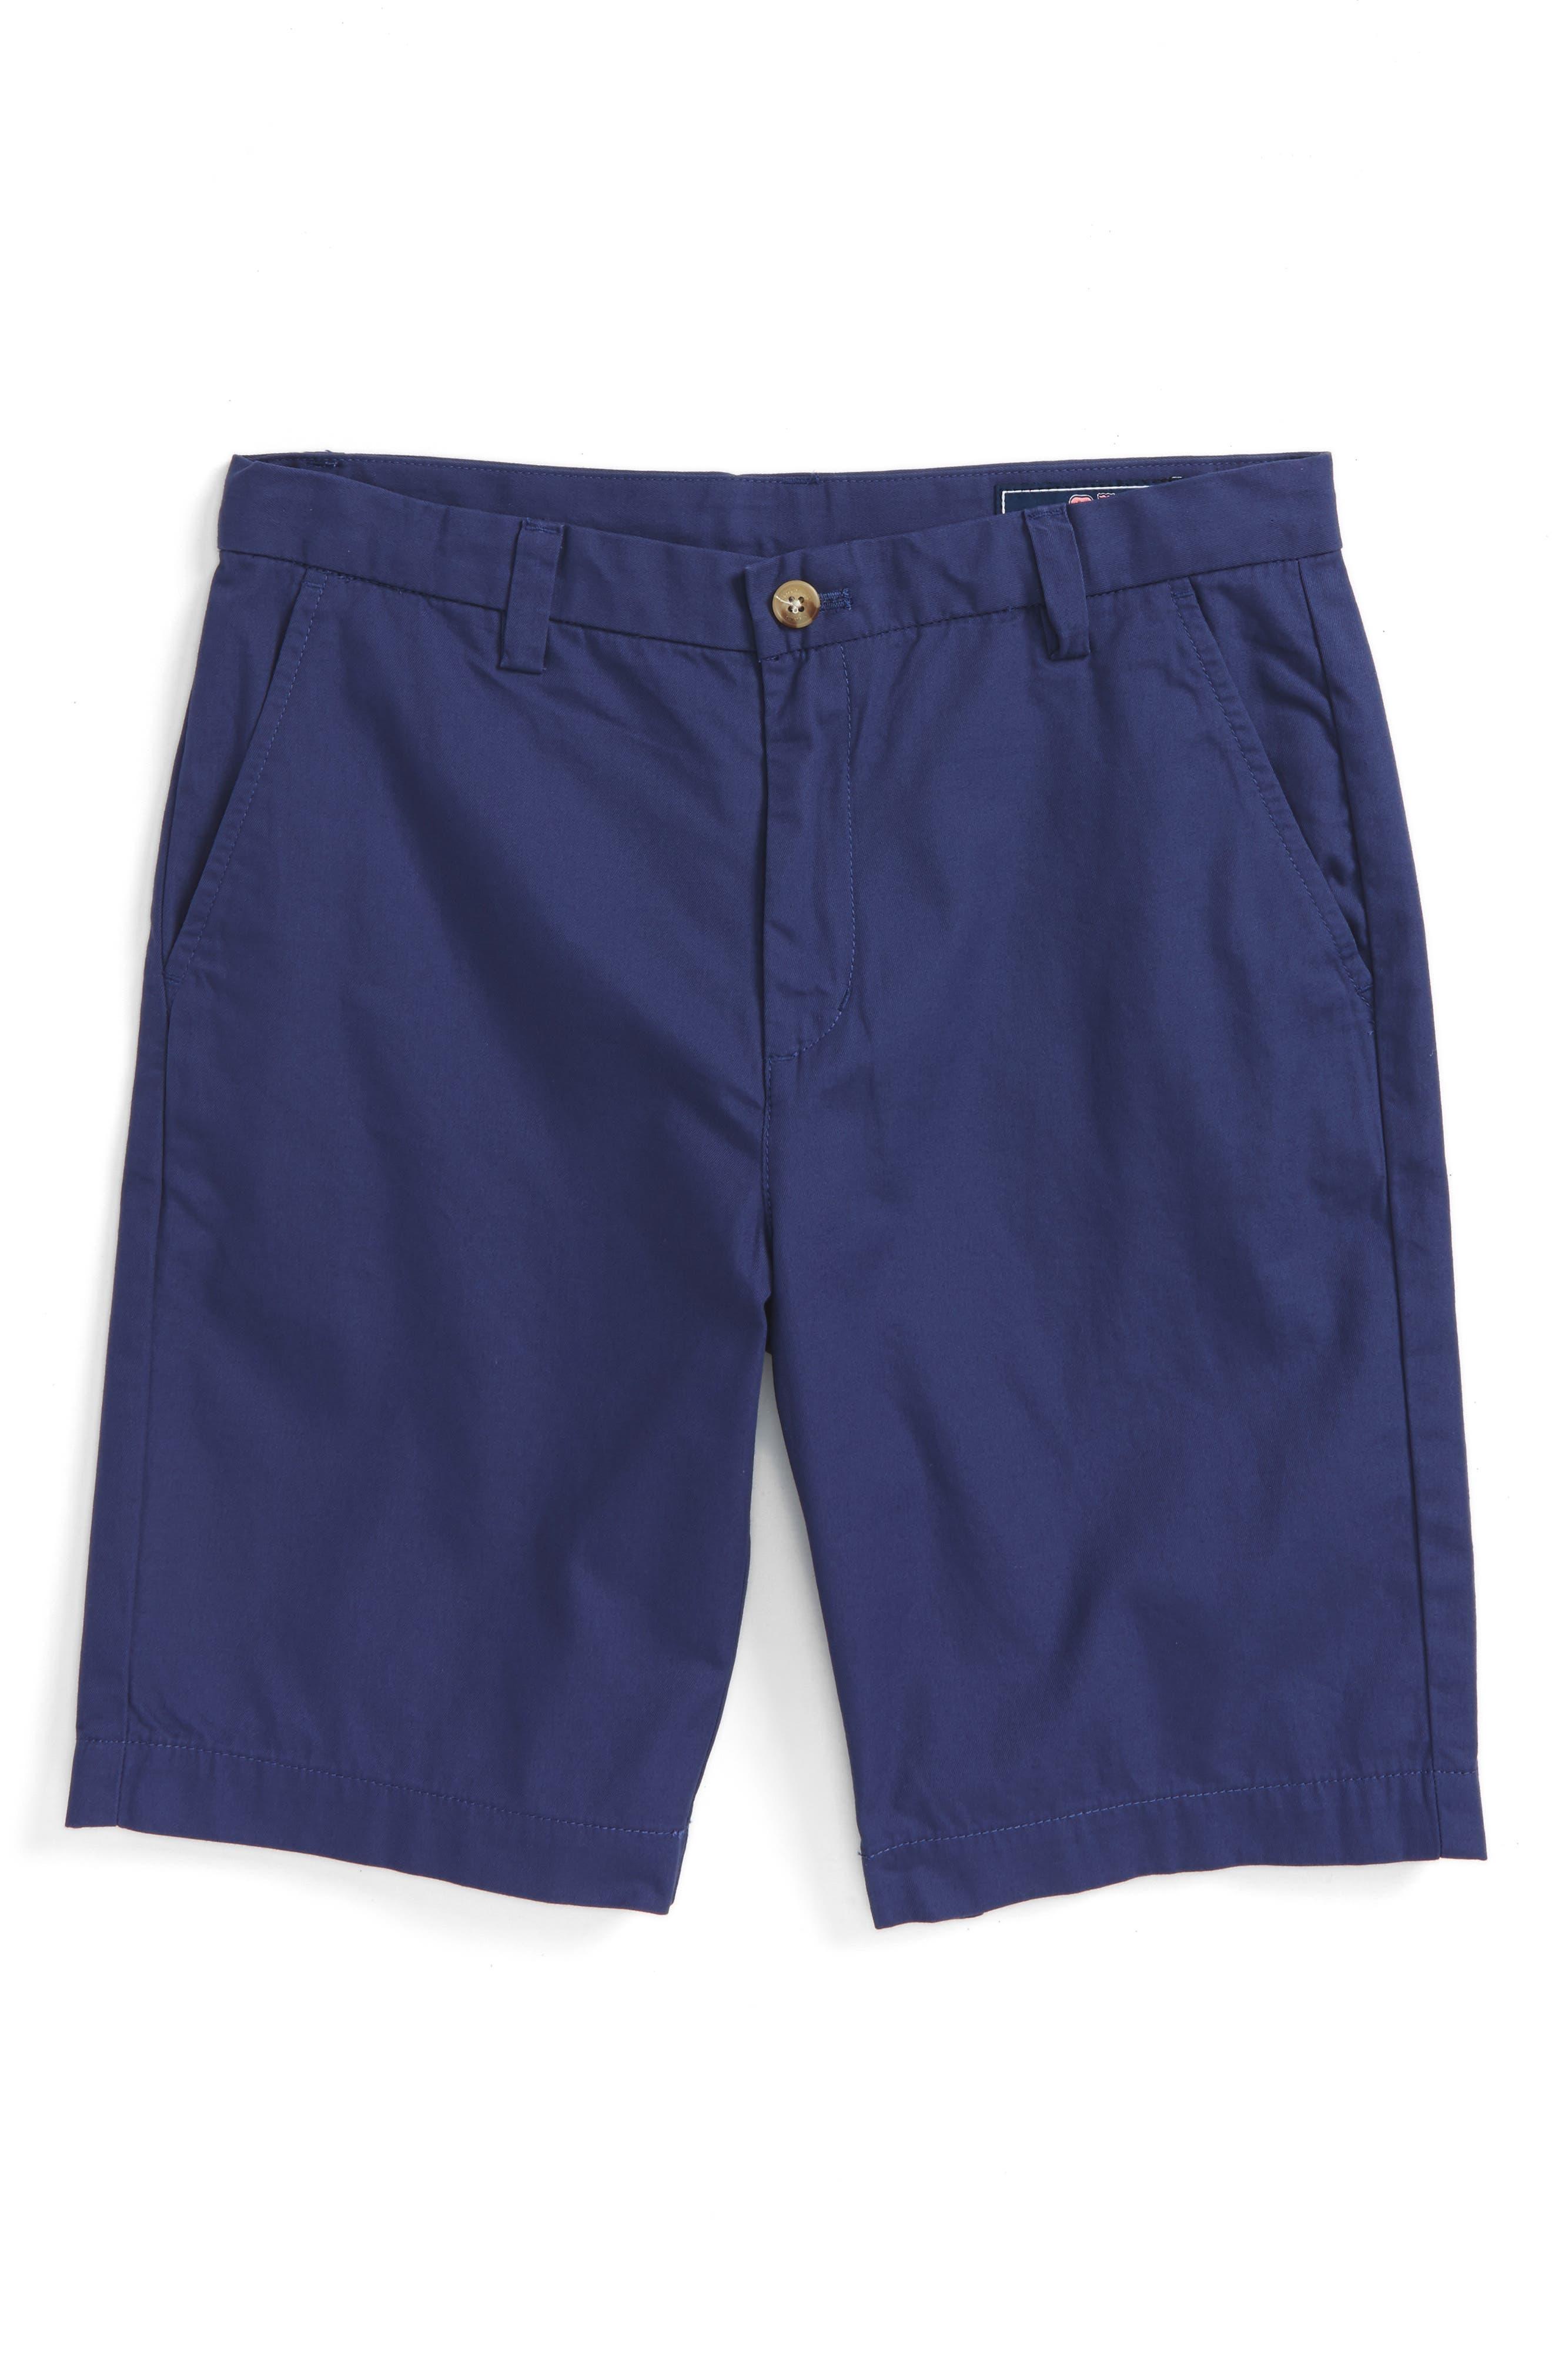 Summer - Breaker Twill Shorts,                             Main thumbnail 1, color,                             Deep Cobalt